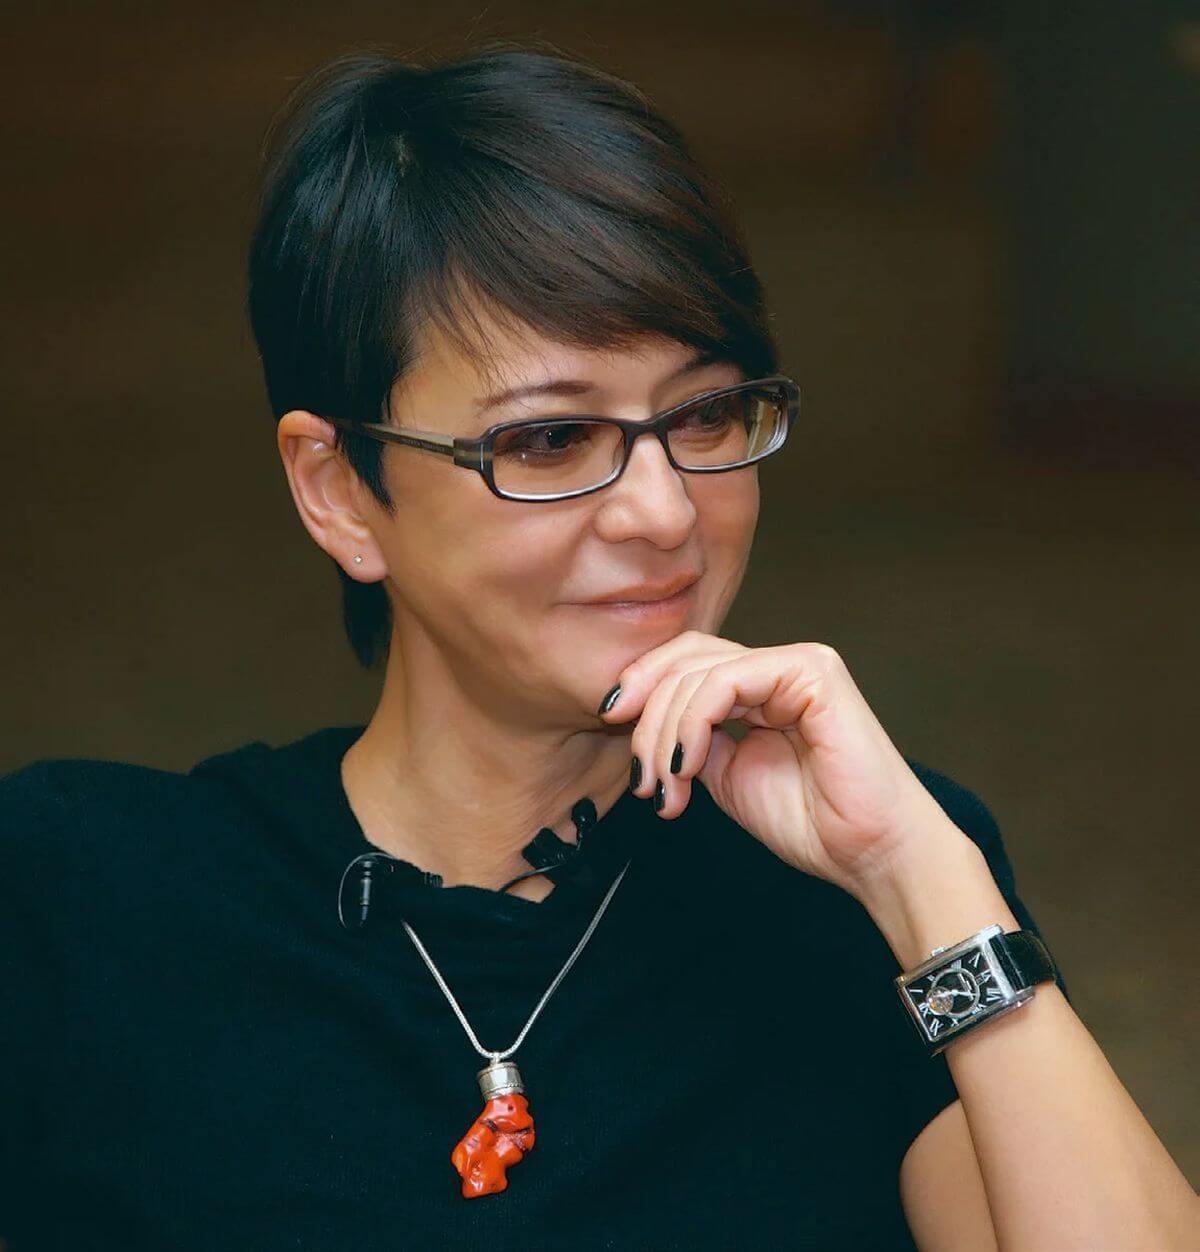 Ирина хакамада - биография, информация, личная жизнь, фото, видео